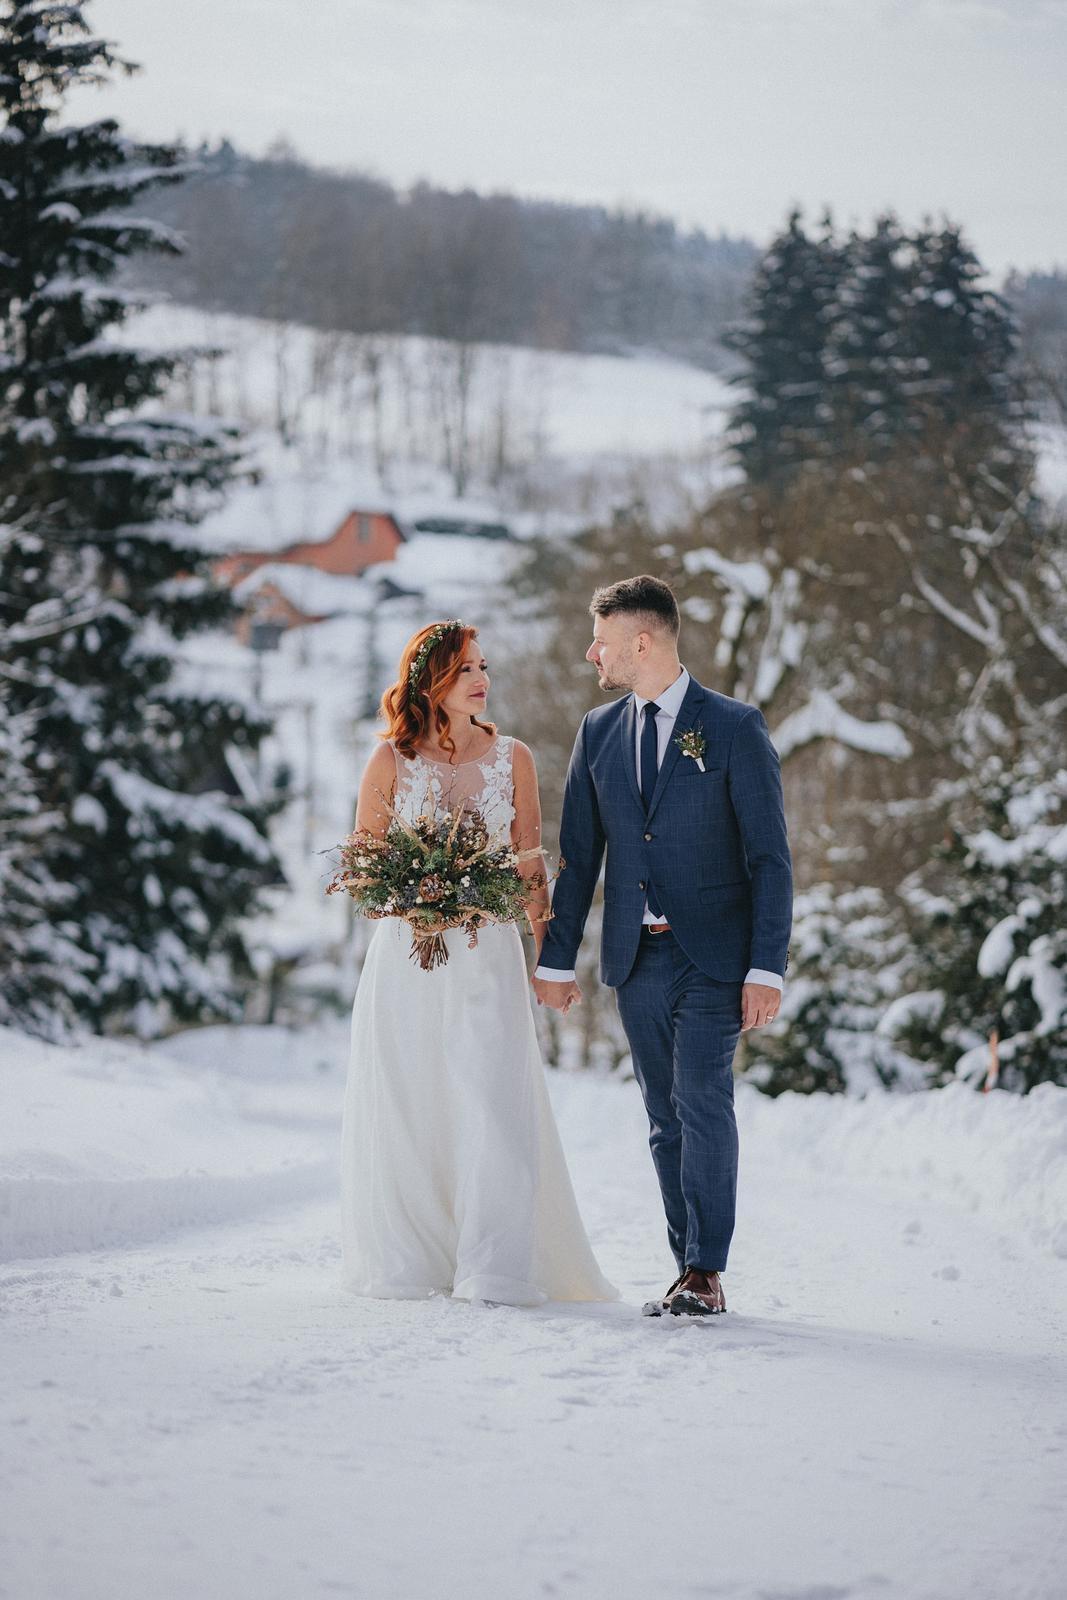 Zimní svatba M&M - Obrázek č. 3